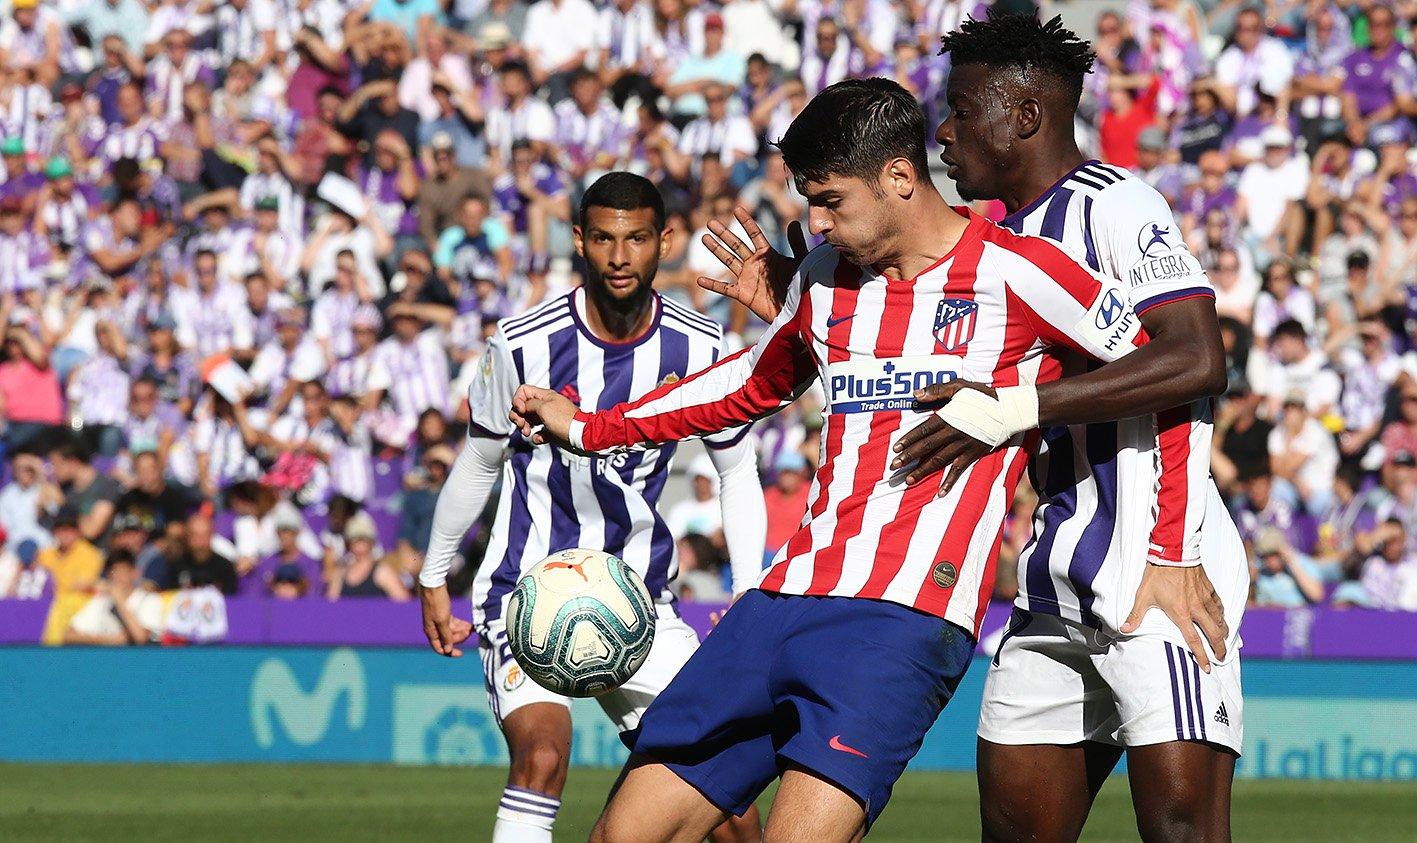 Atlético de Madrid empató. Foto: Twitter